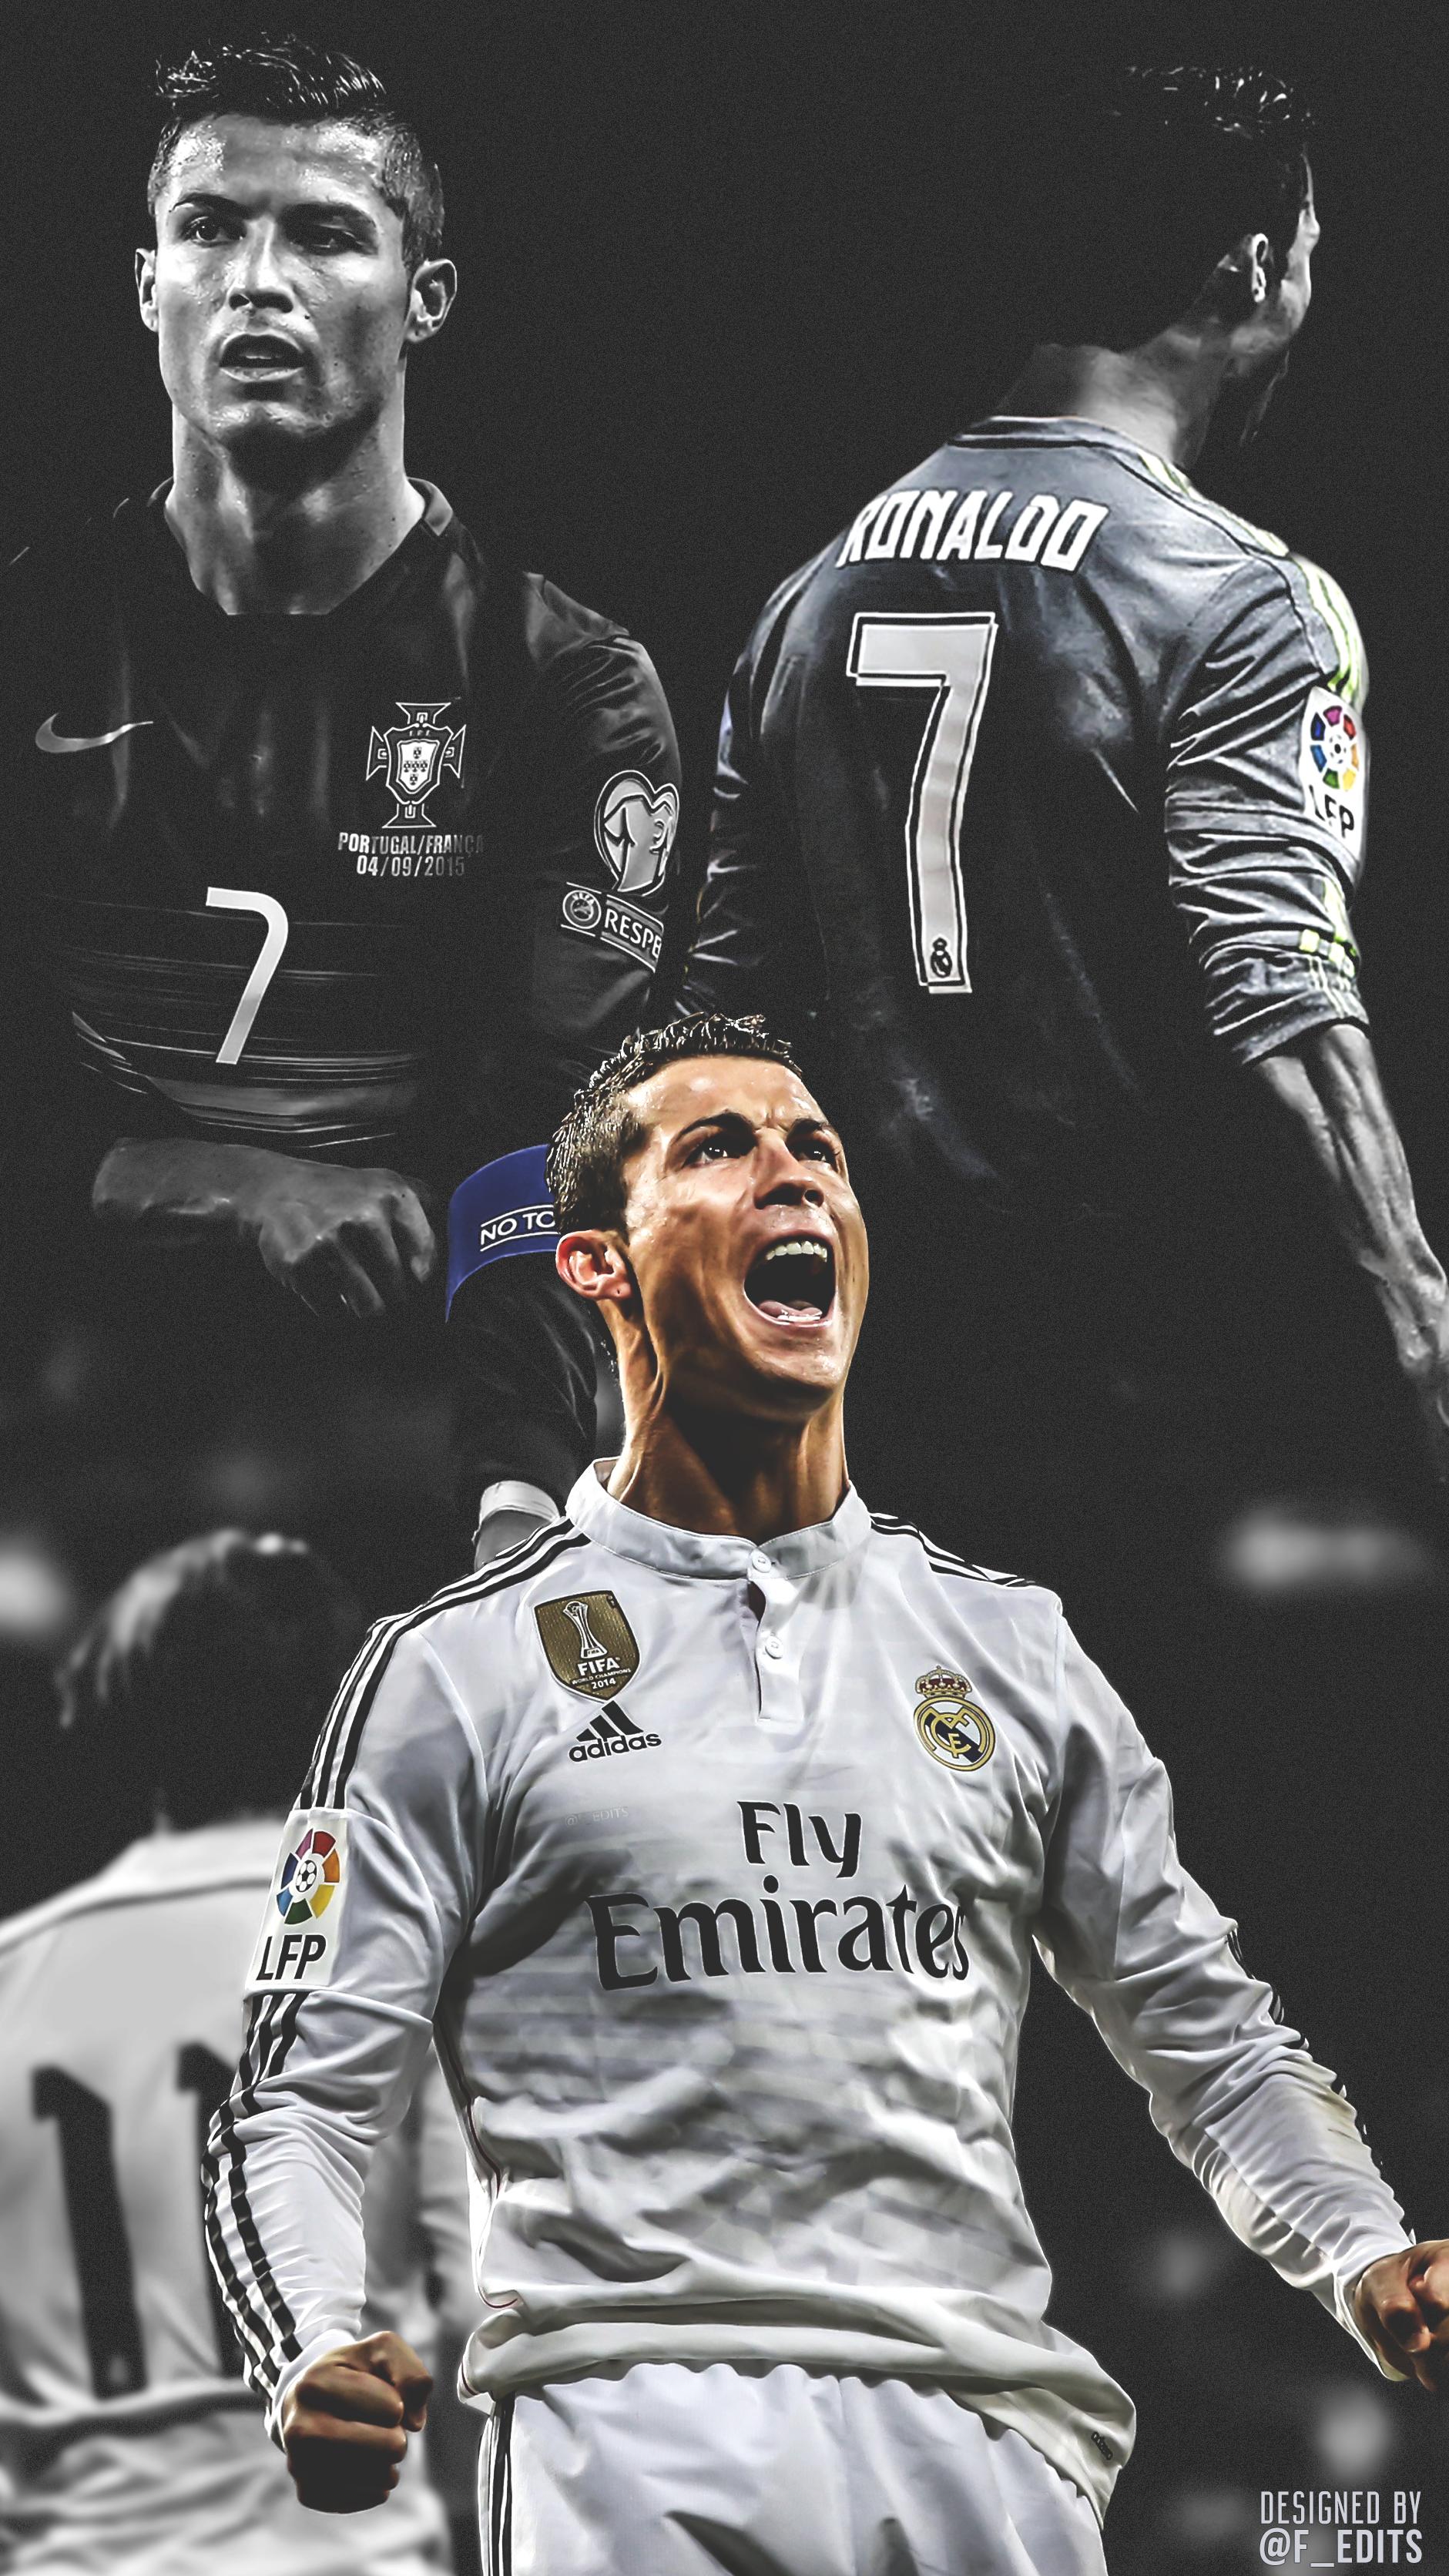 Real Madrid Ronaldo Wallpapers Cristiano Ronaldo Wallpapers Cristiano Ronaldo Cr7